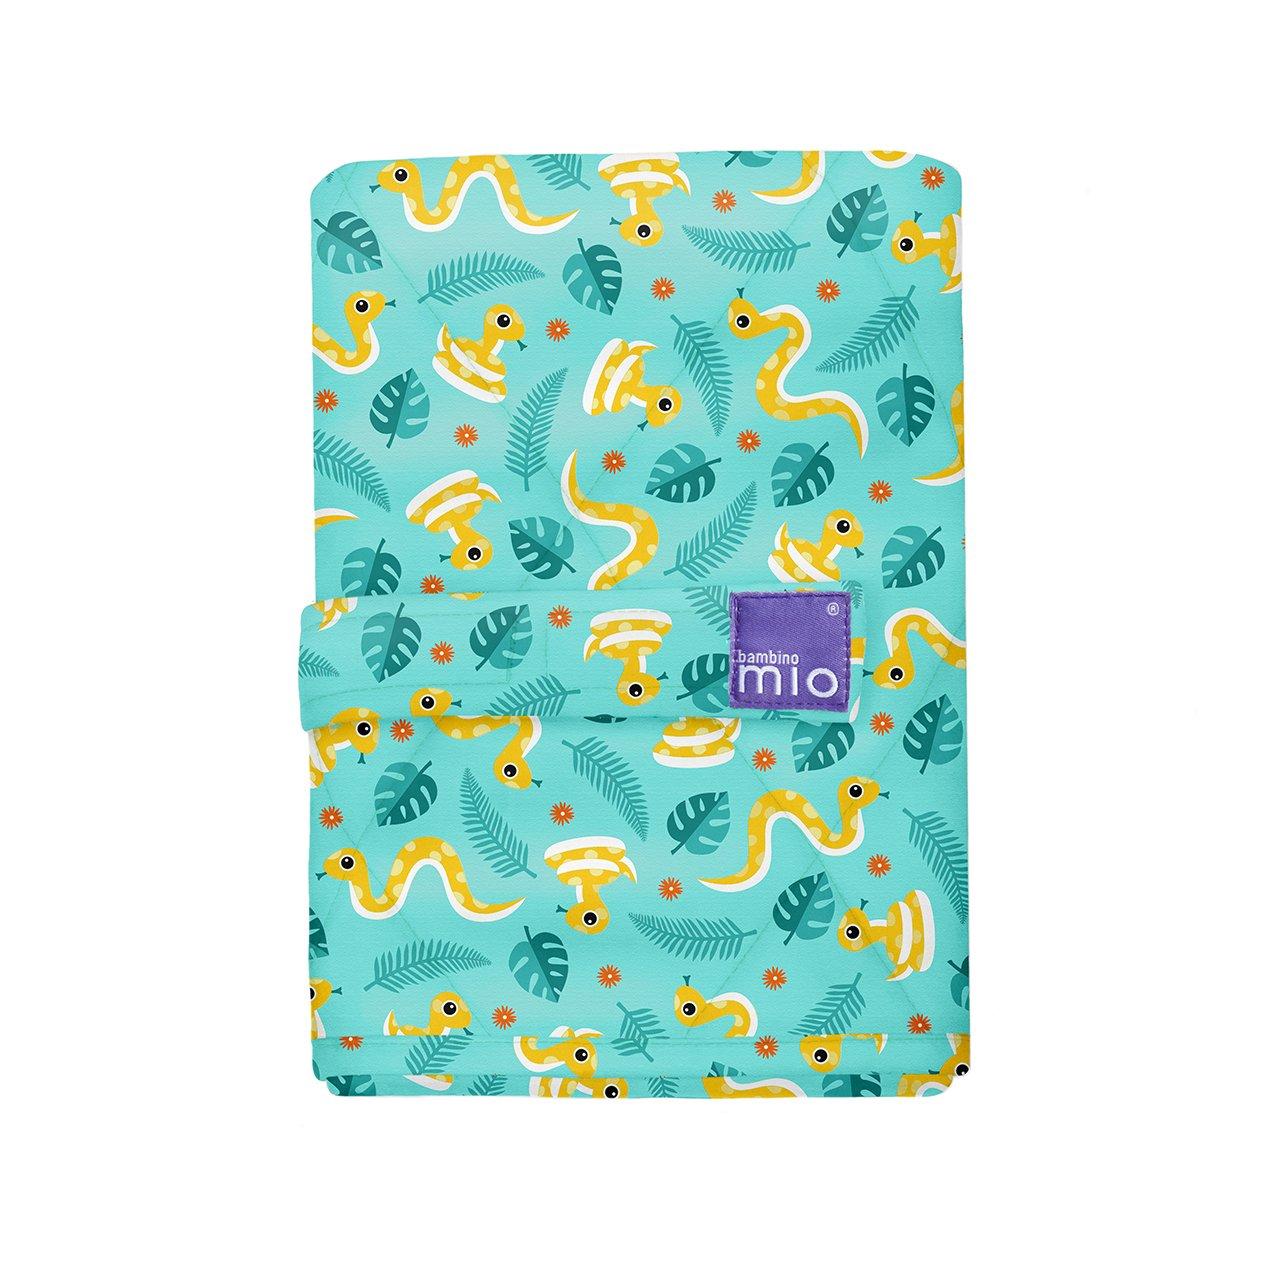 Bambino Mio butterfly bloom change mat